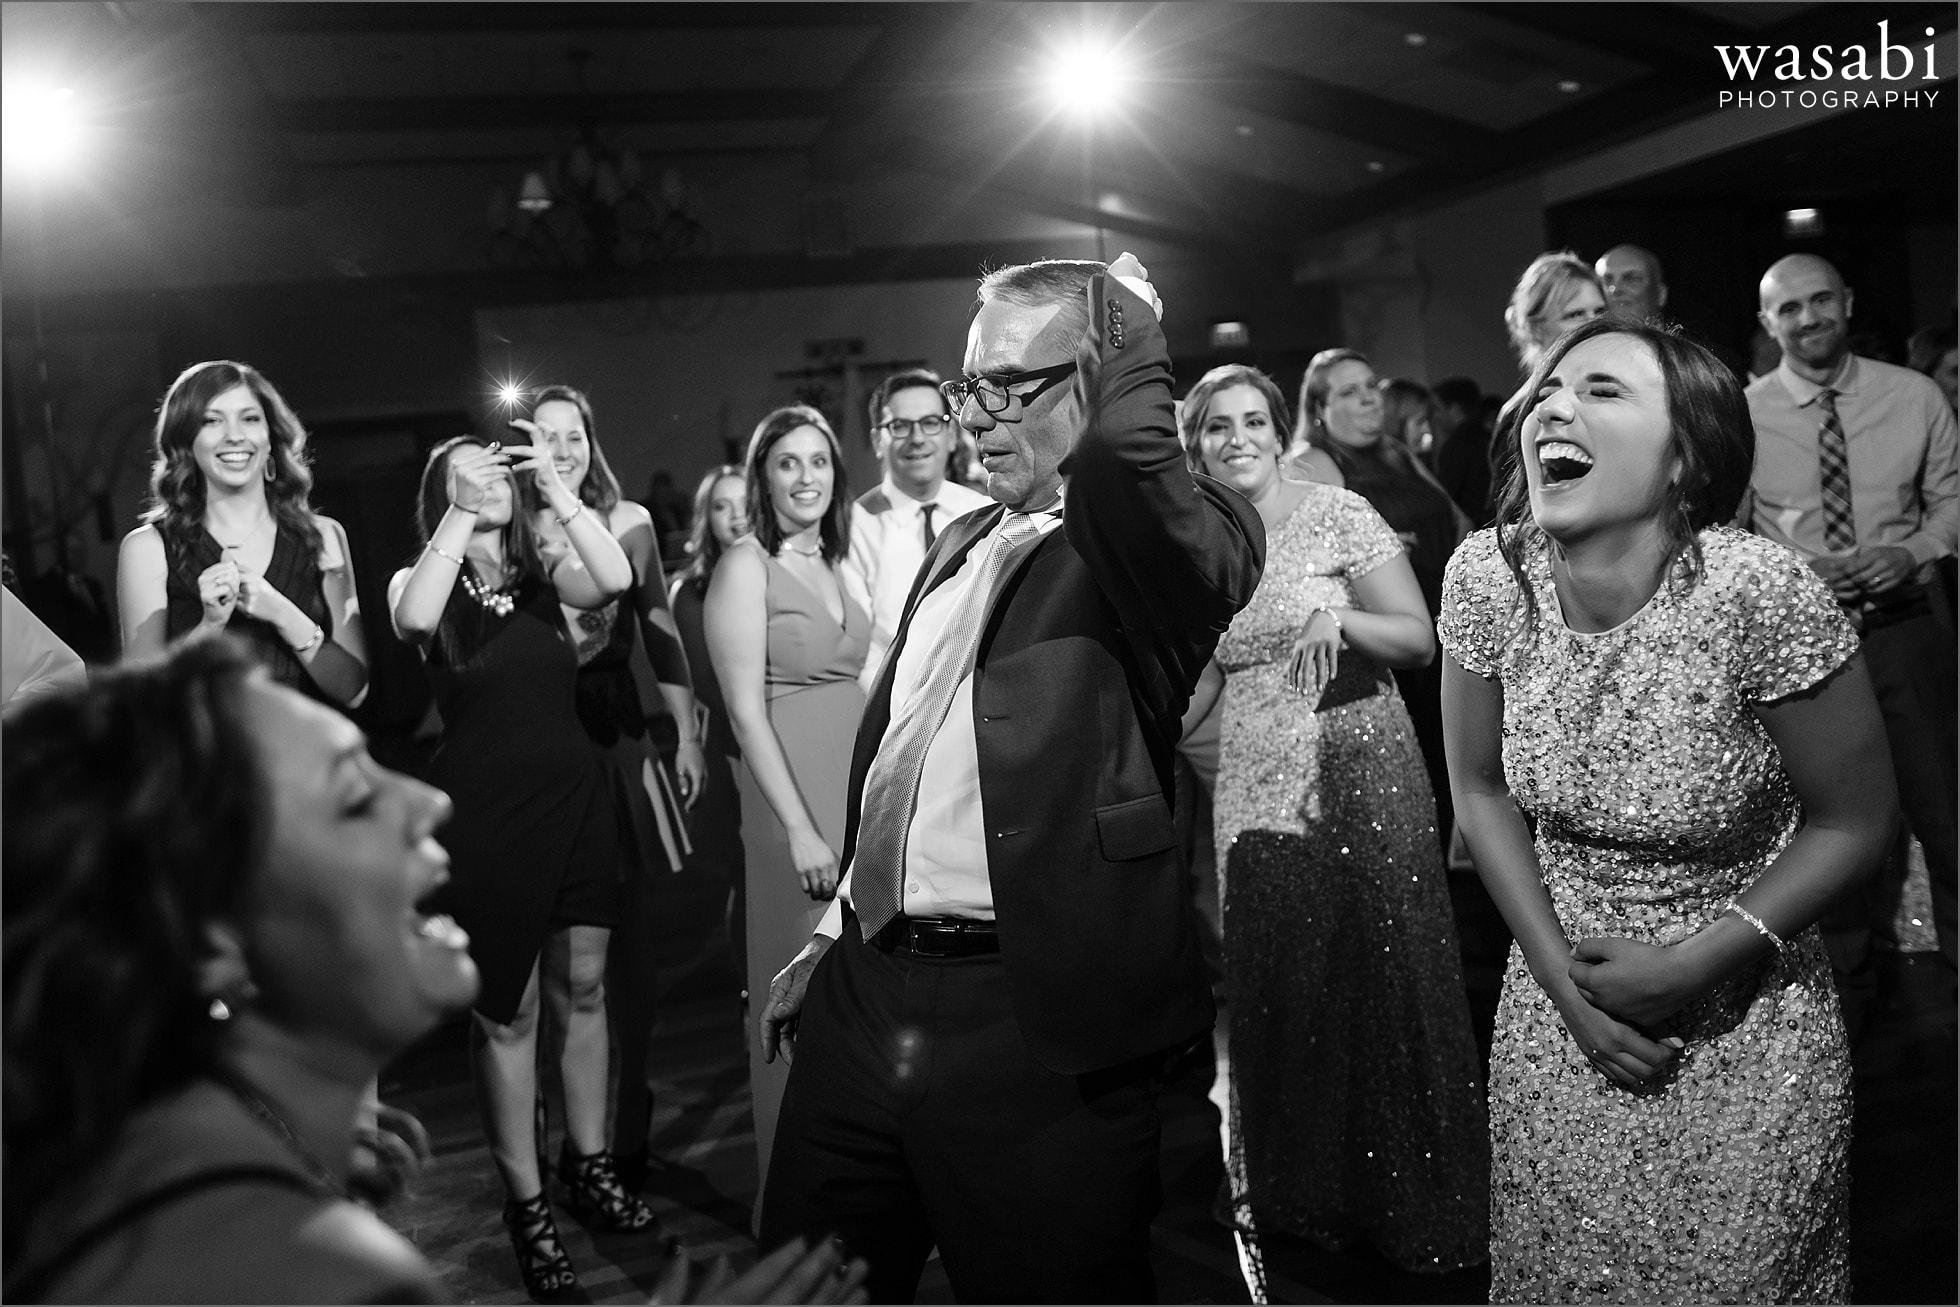 ivanhoe country club wedding reception photos